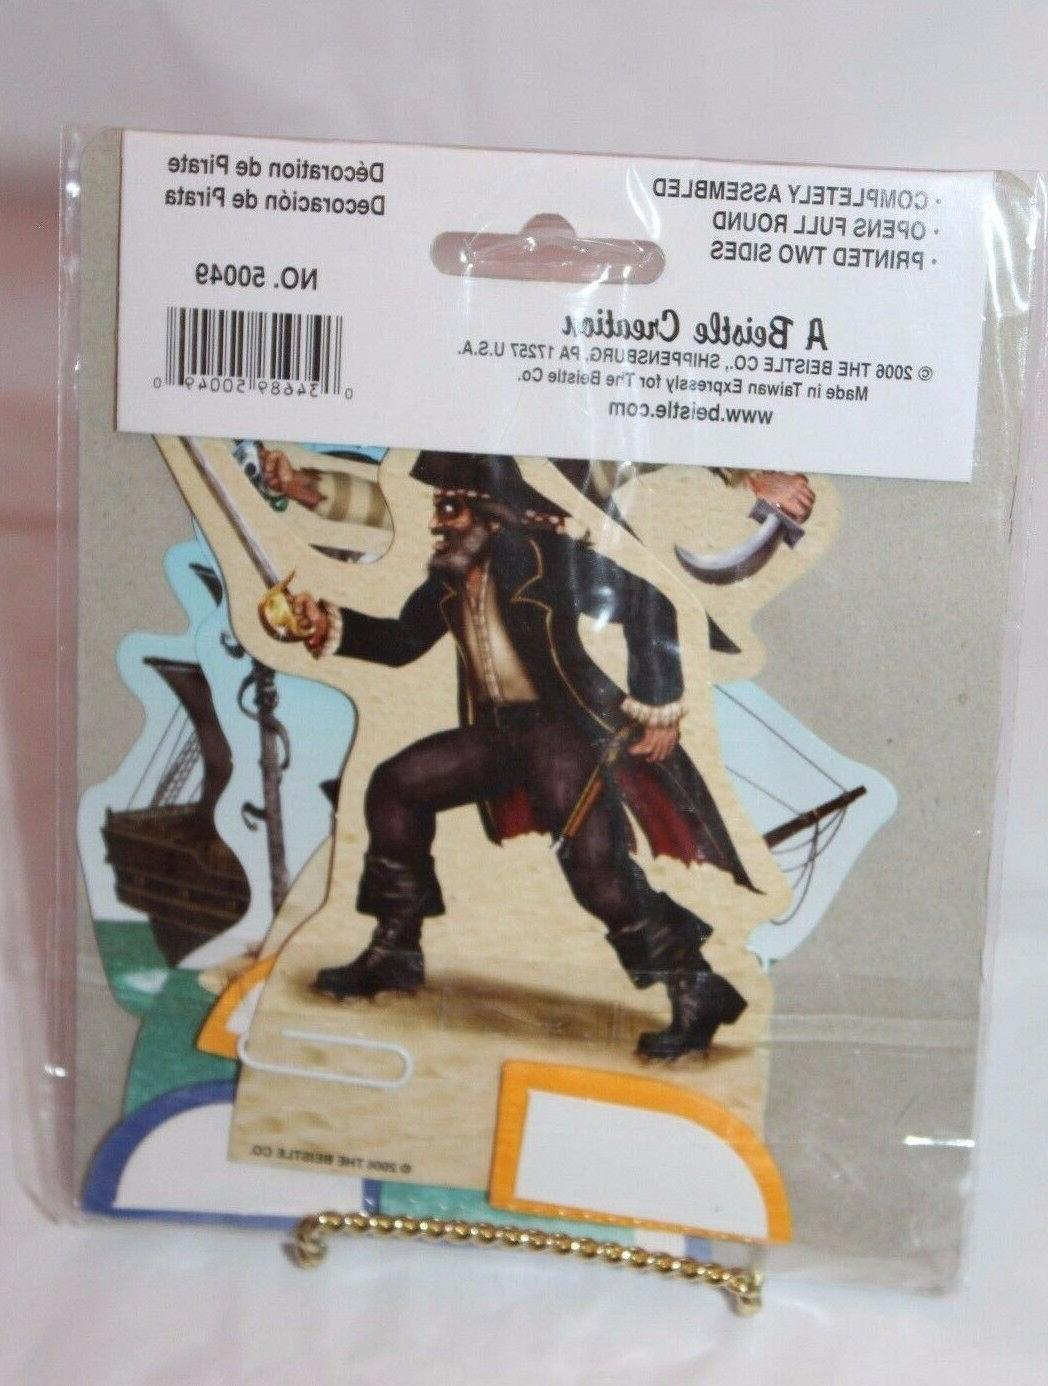 pirate playmates honeycomb centerpieces